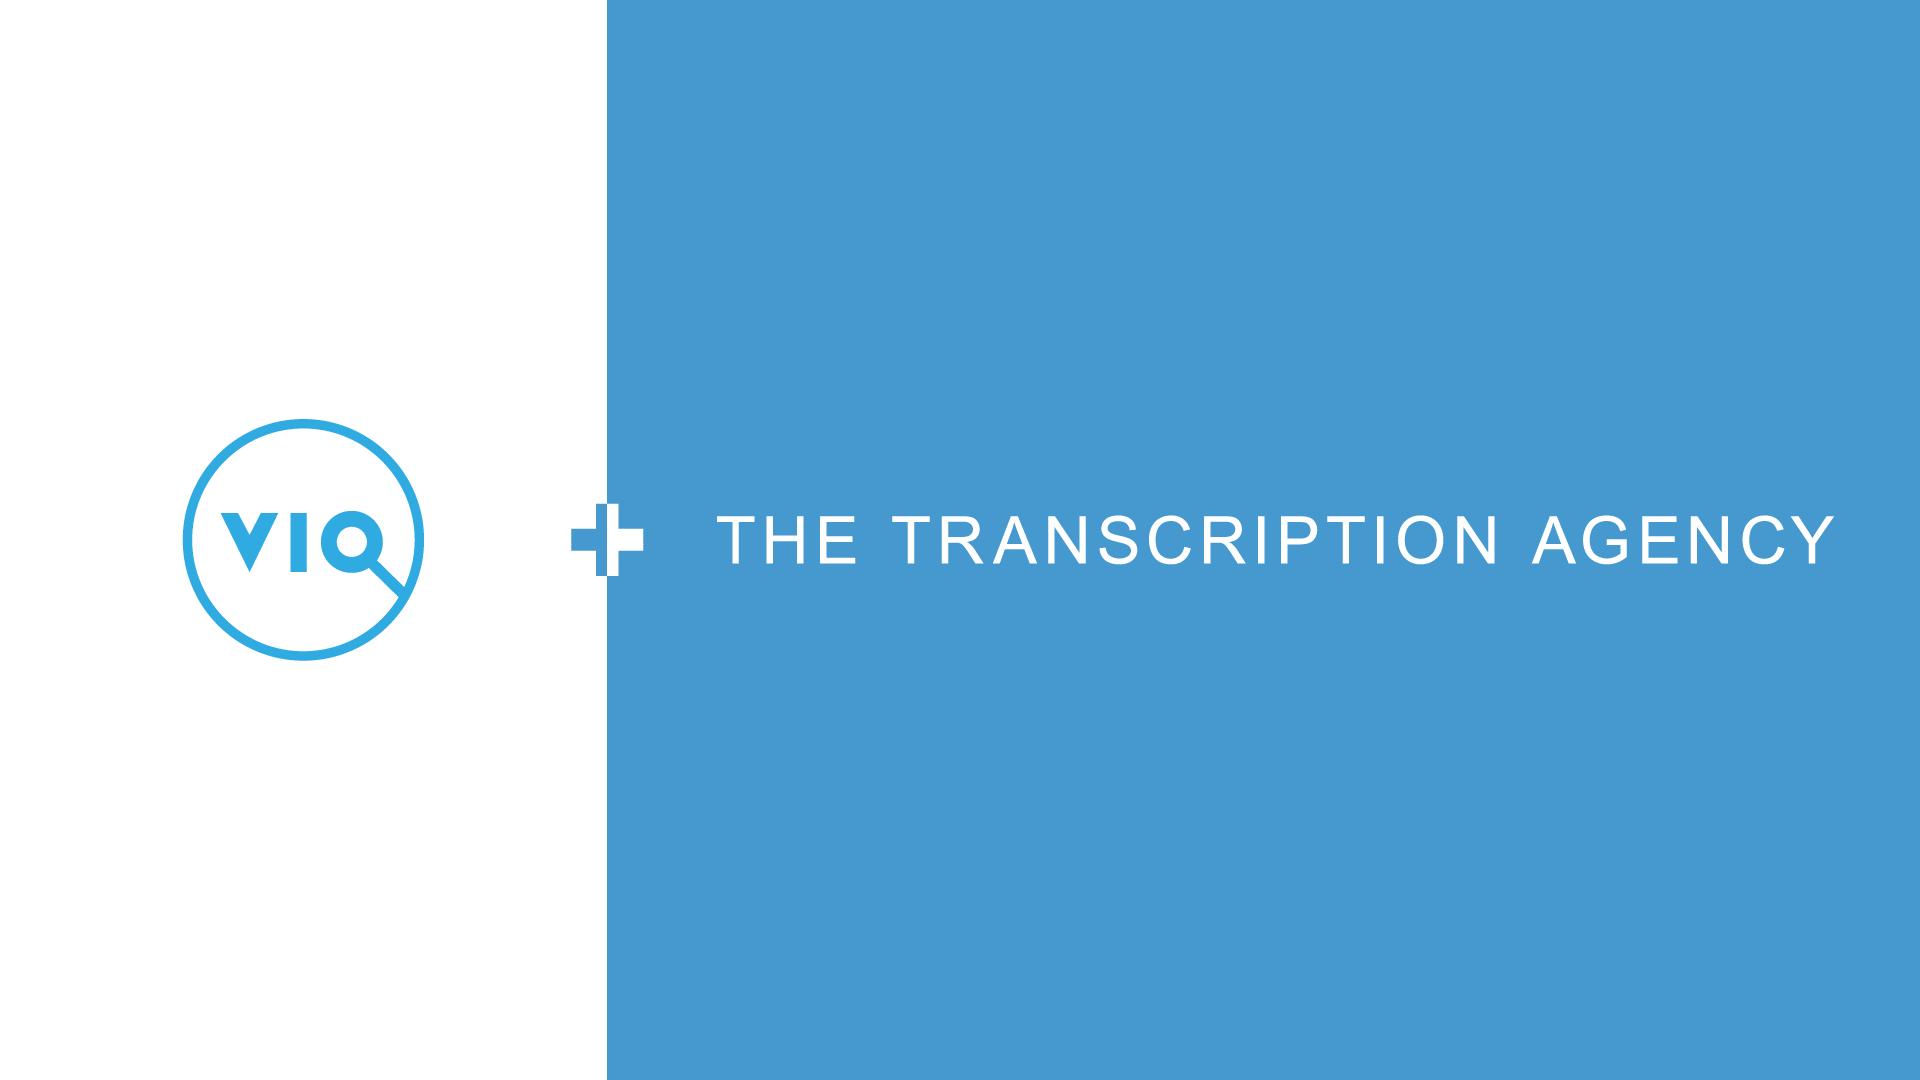 VIQ TTA Acquisition